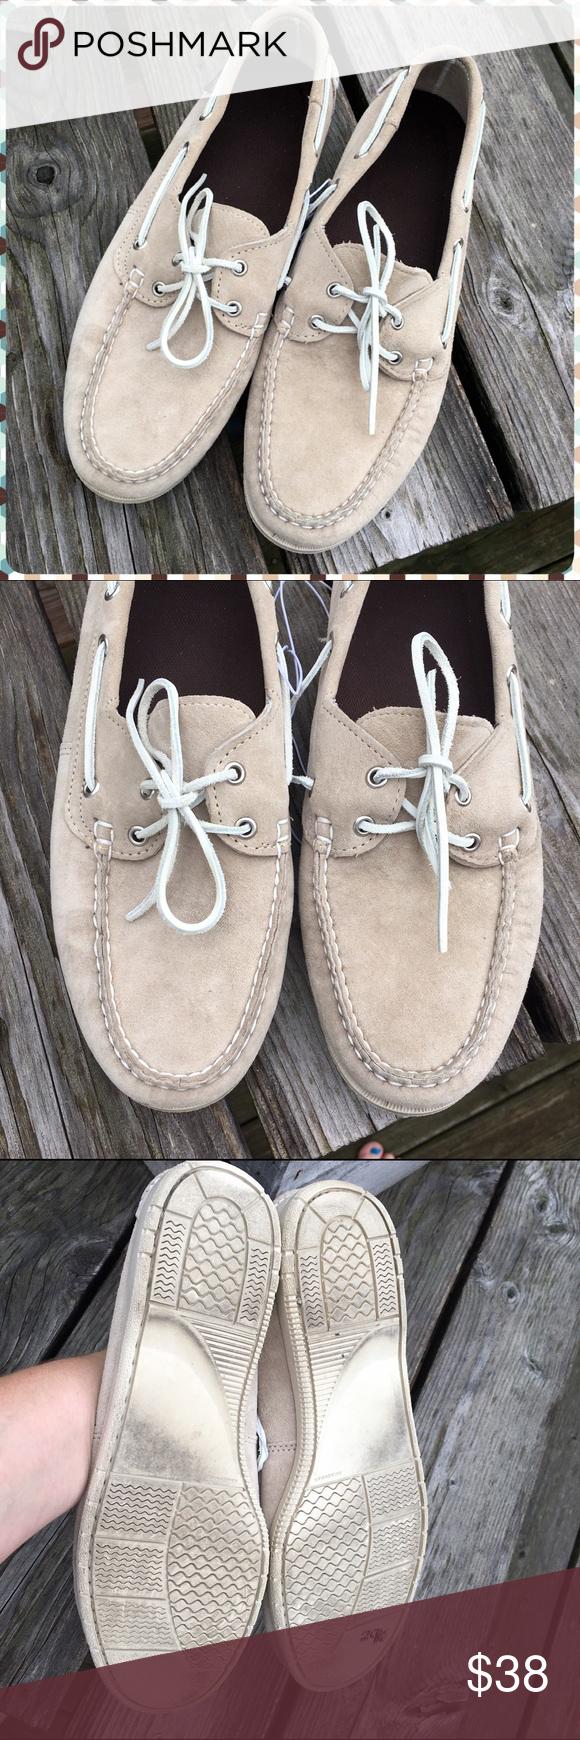 Listing! Eddie Bauer Men's Boat Shoes! EUC! Light taupe